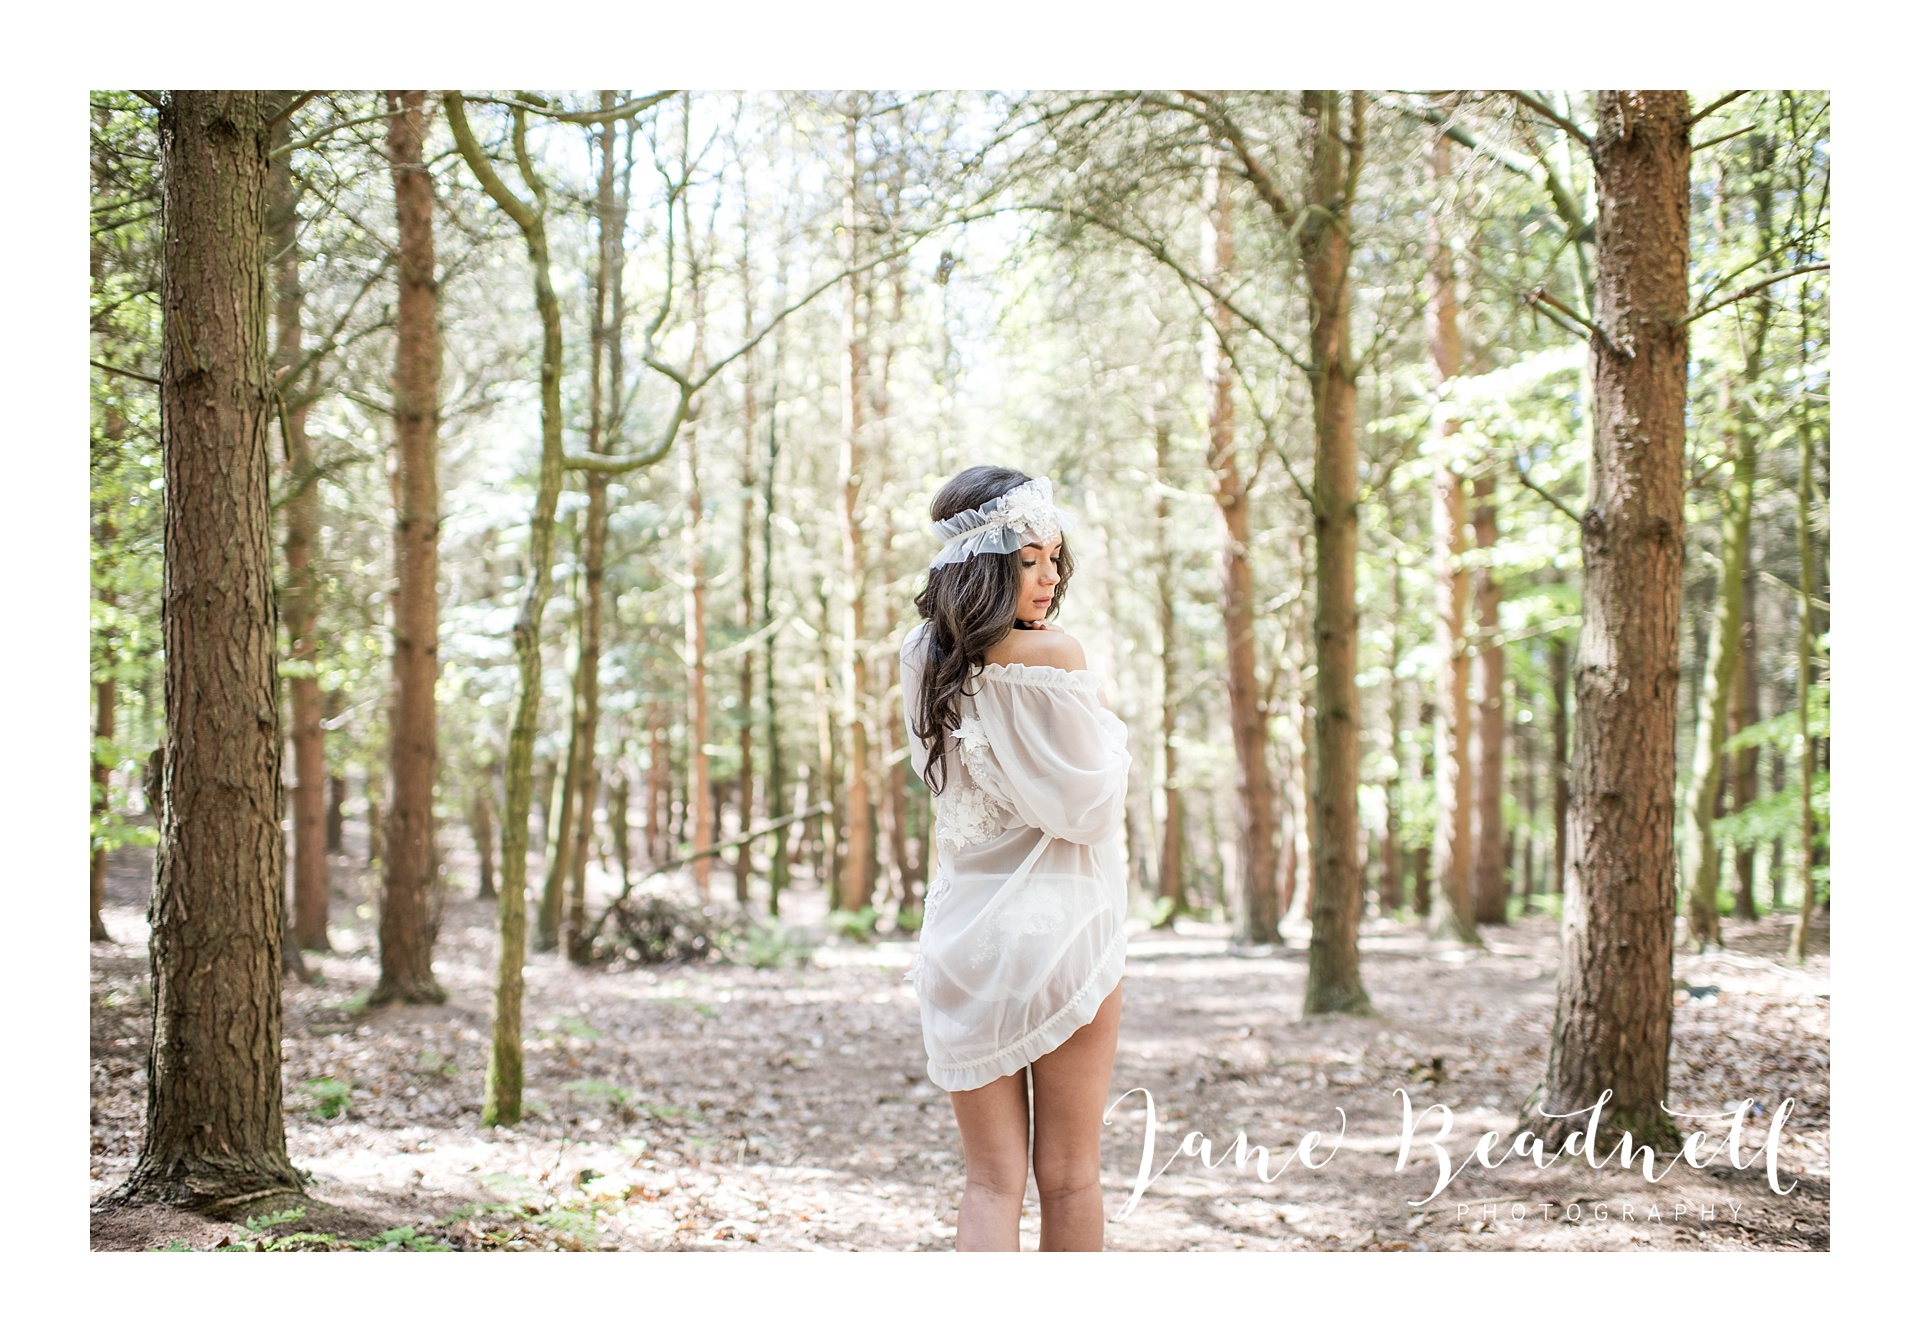 Fine Art Boudoir Photography by wedding photographer Jane Beadnell Photography Otley_0024